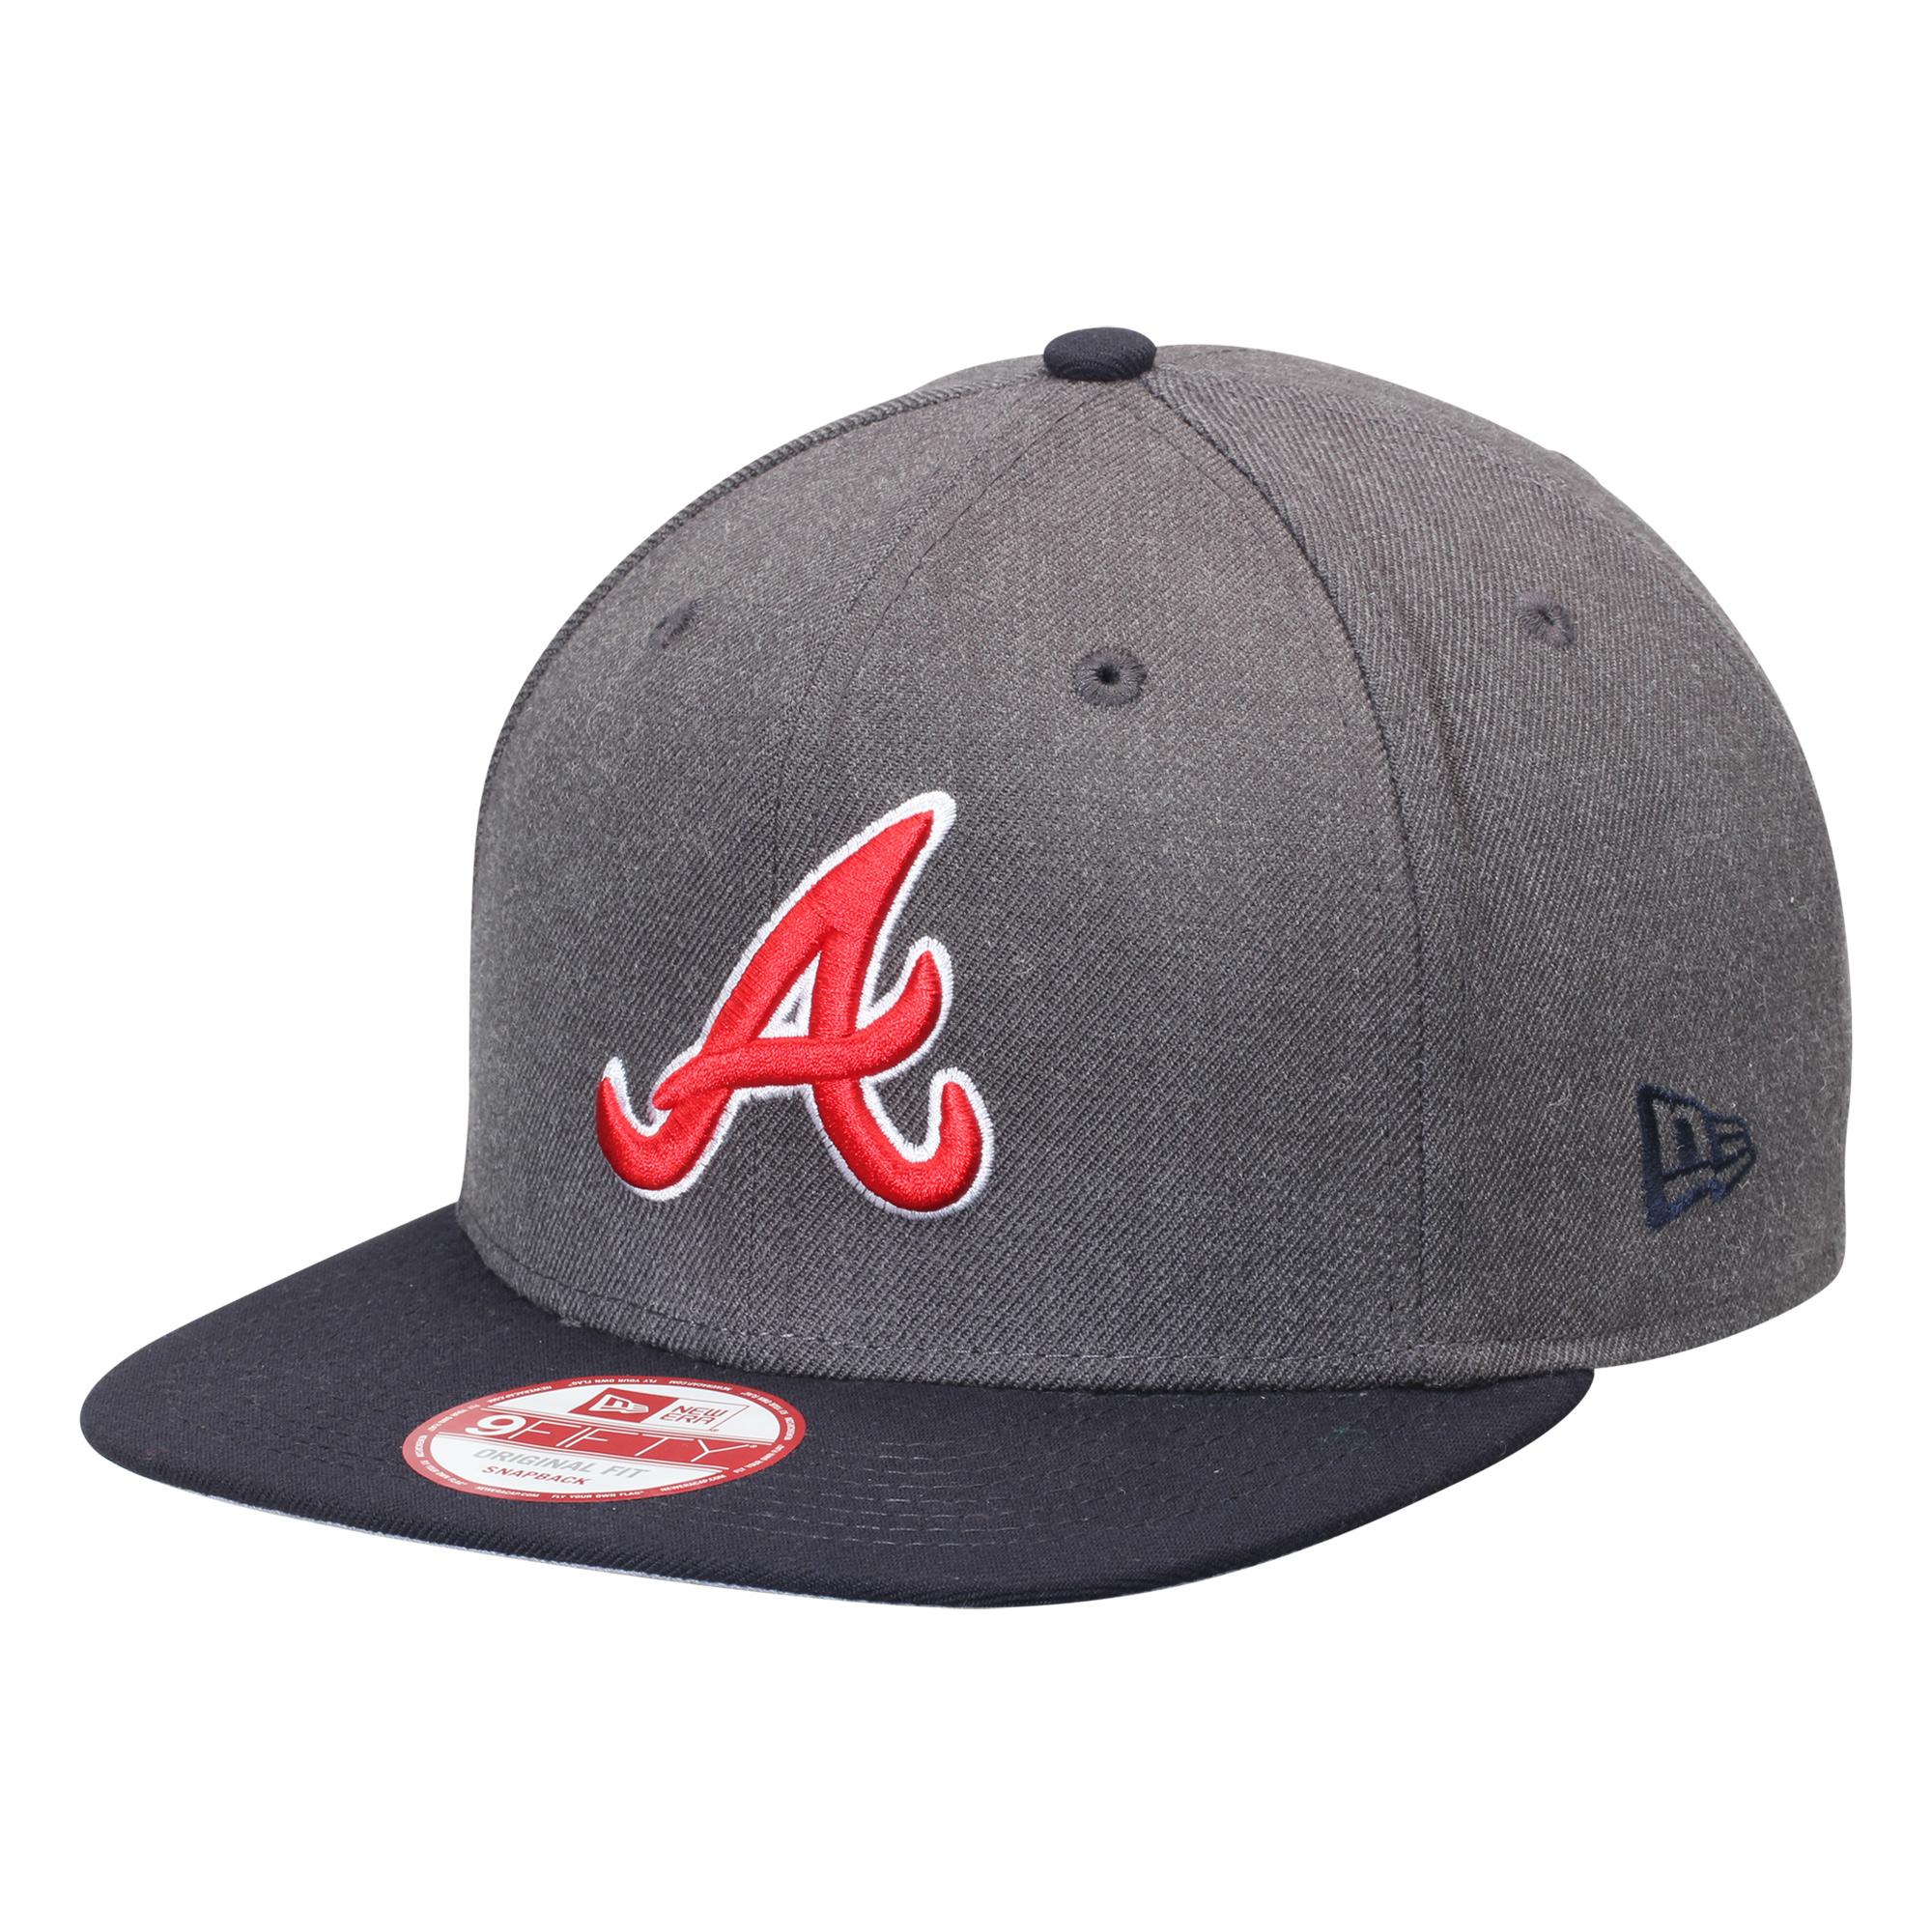 Atlanta Braves New Era Original Fit 9FIFTY Snapback Adjustable Hat - Graphite/Navy - OSFA